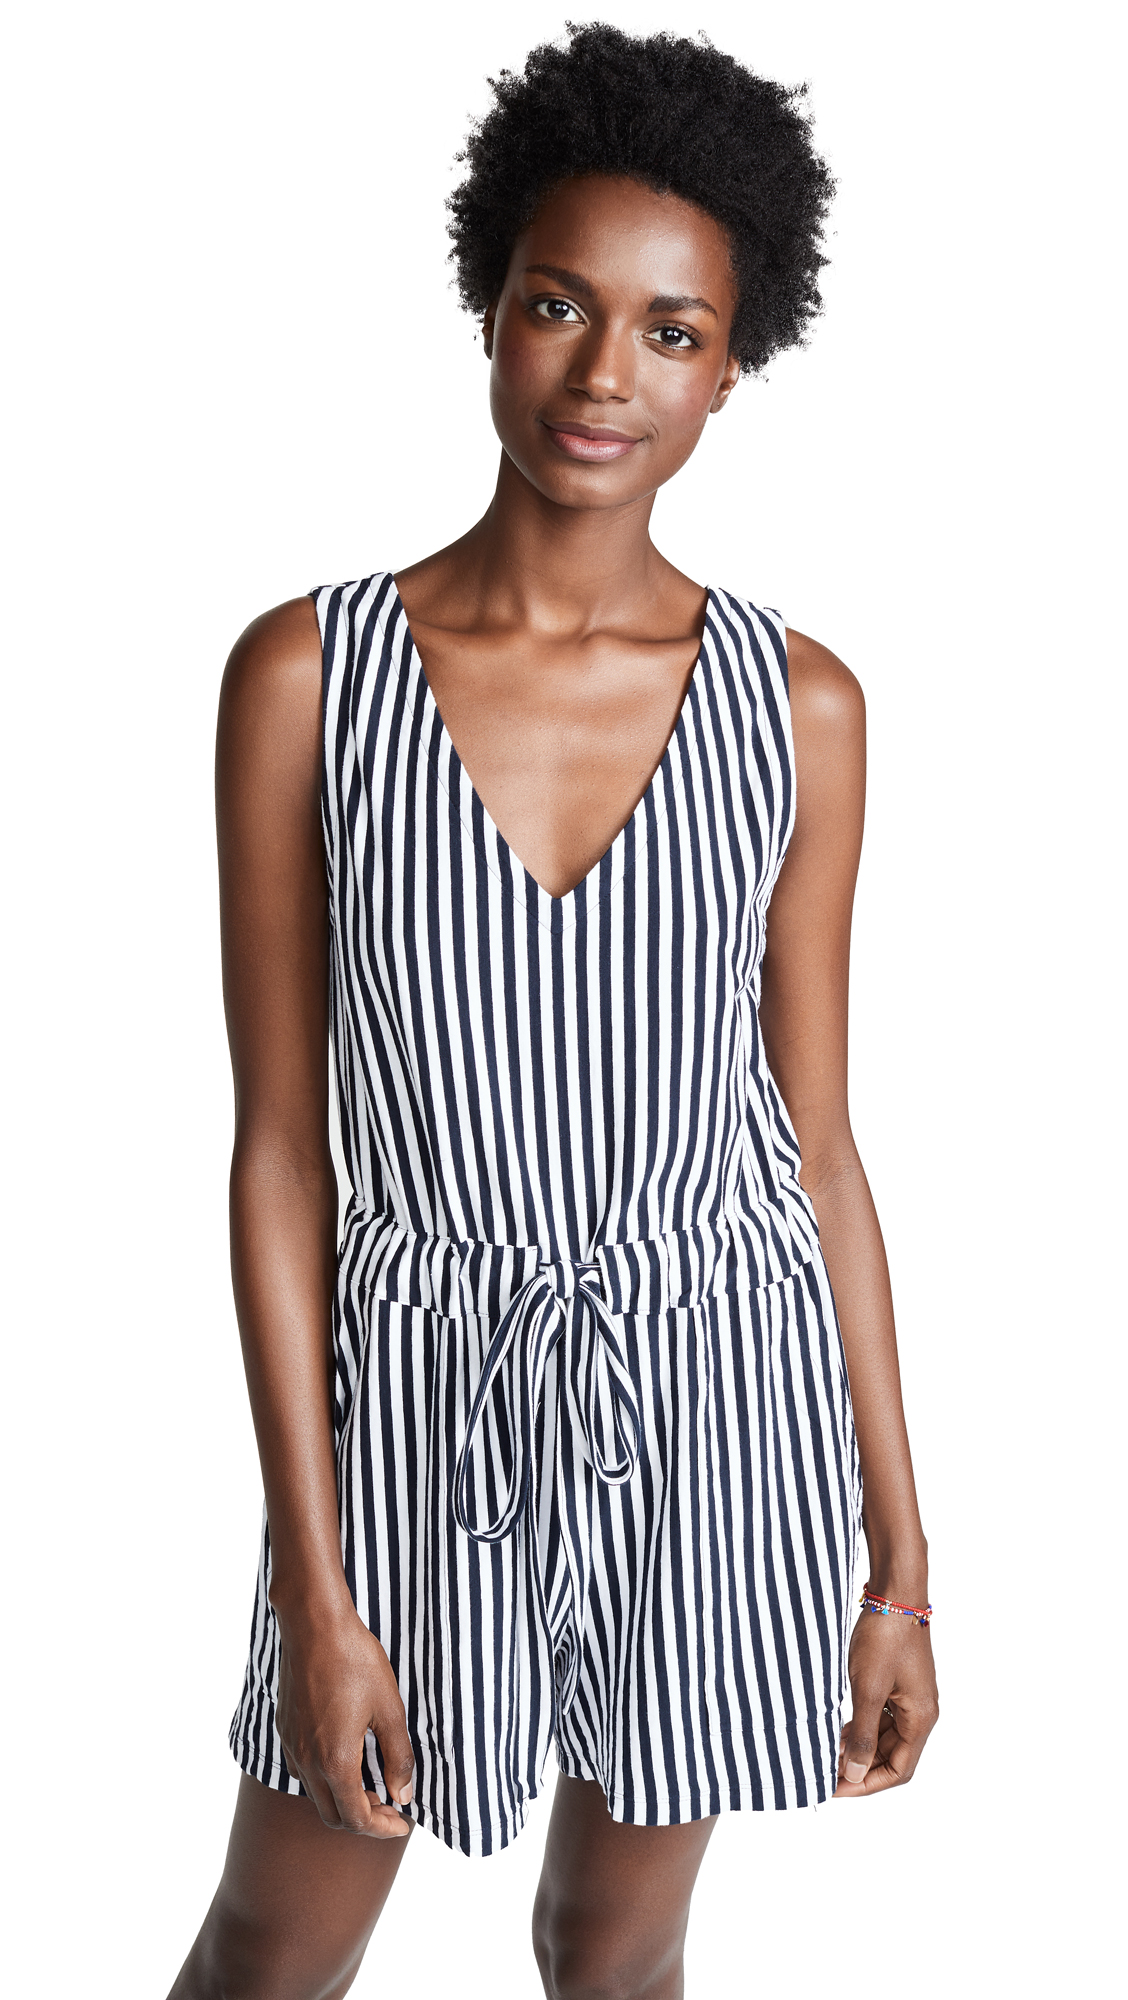 MDS Stripes Amanda Romper - Navy/White Stripe